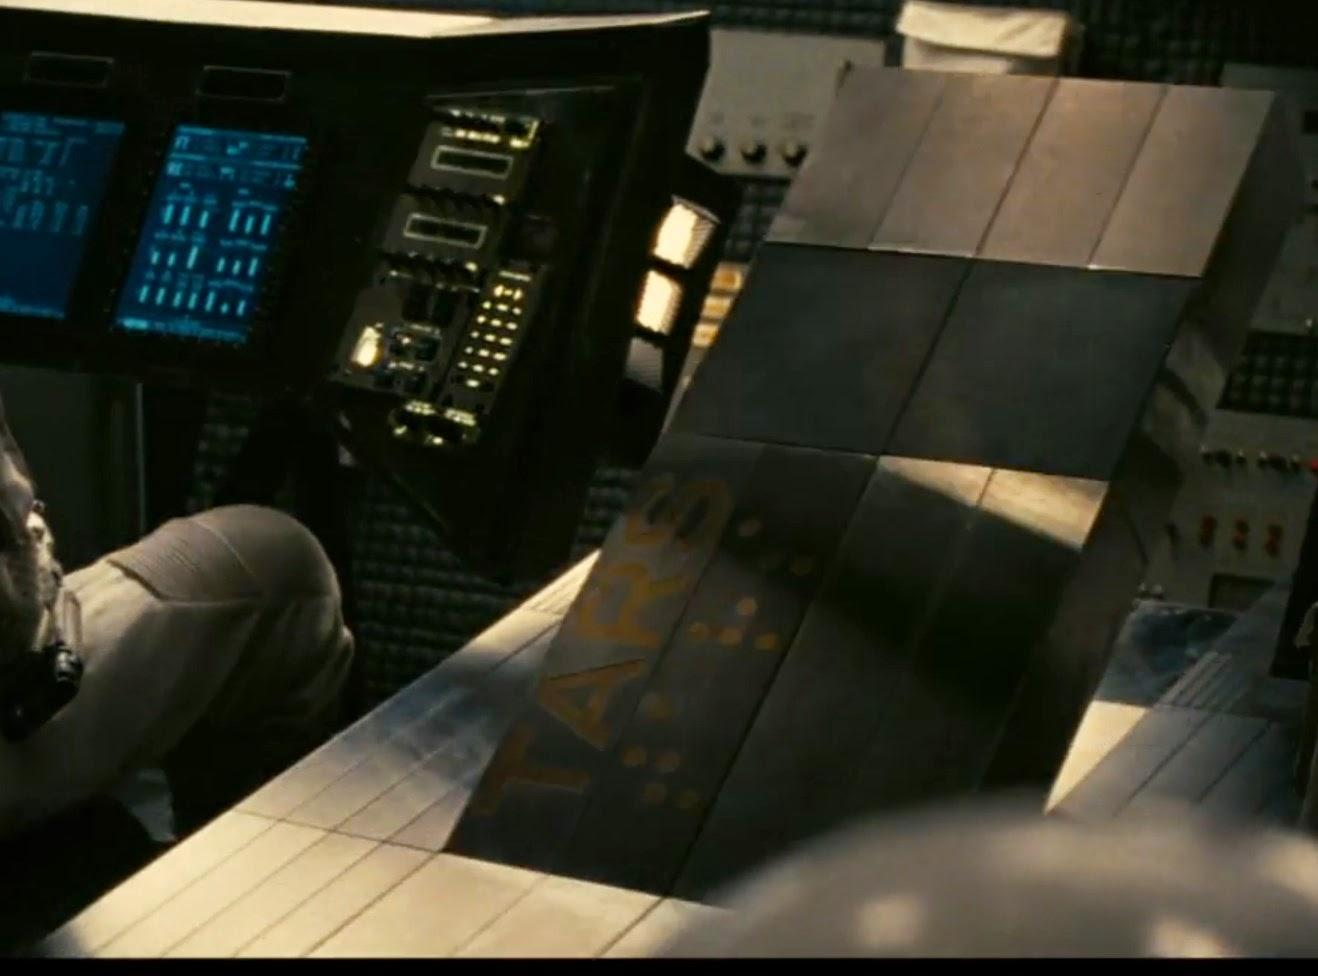 Interstellar : 2014 l'odyssée de l'espèce